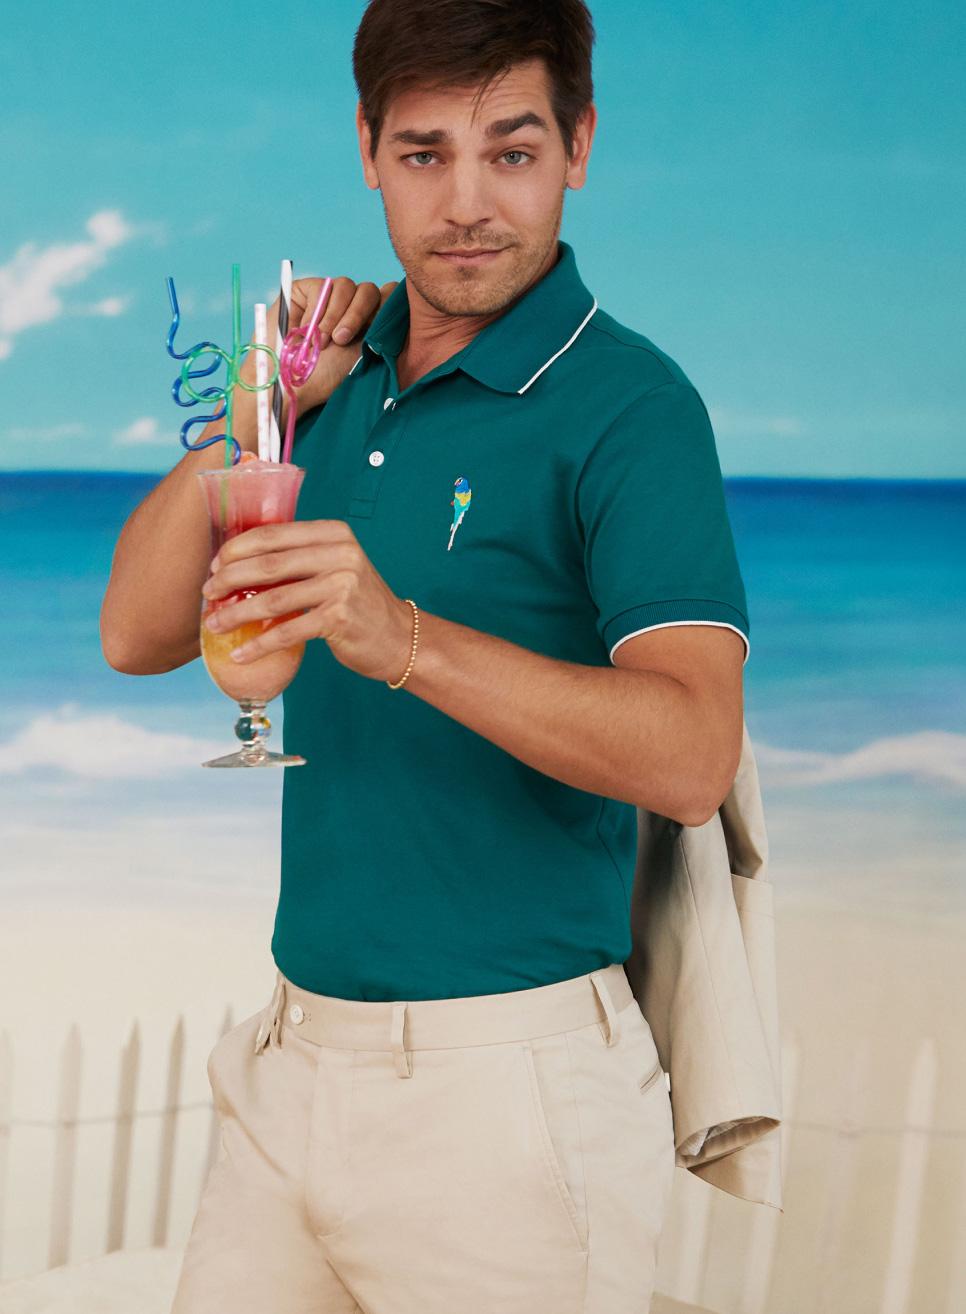 image of Matt Rogers wearing a green polo